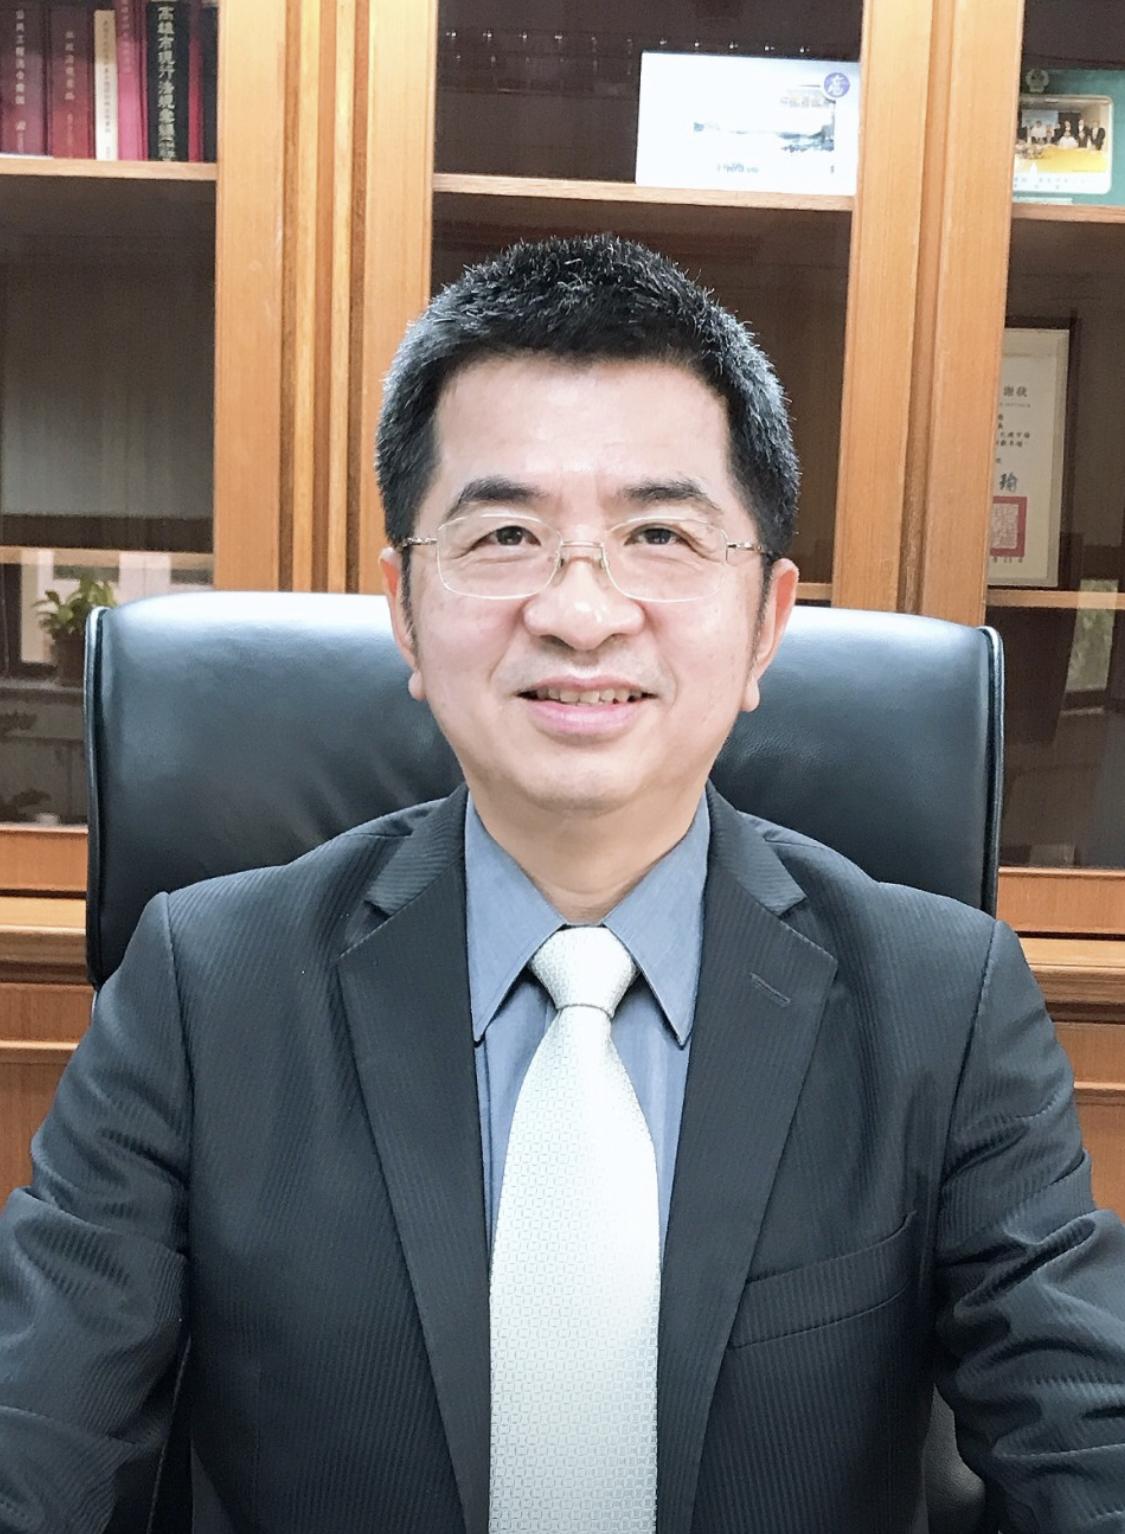 http://lawyuan.nuk.edu.tw:8081/Uploads/image/1092E3A11.png